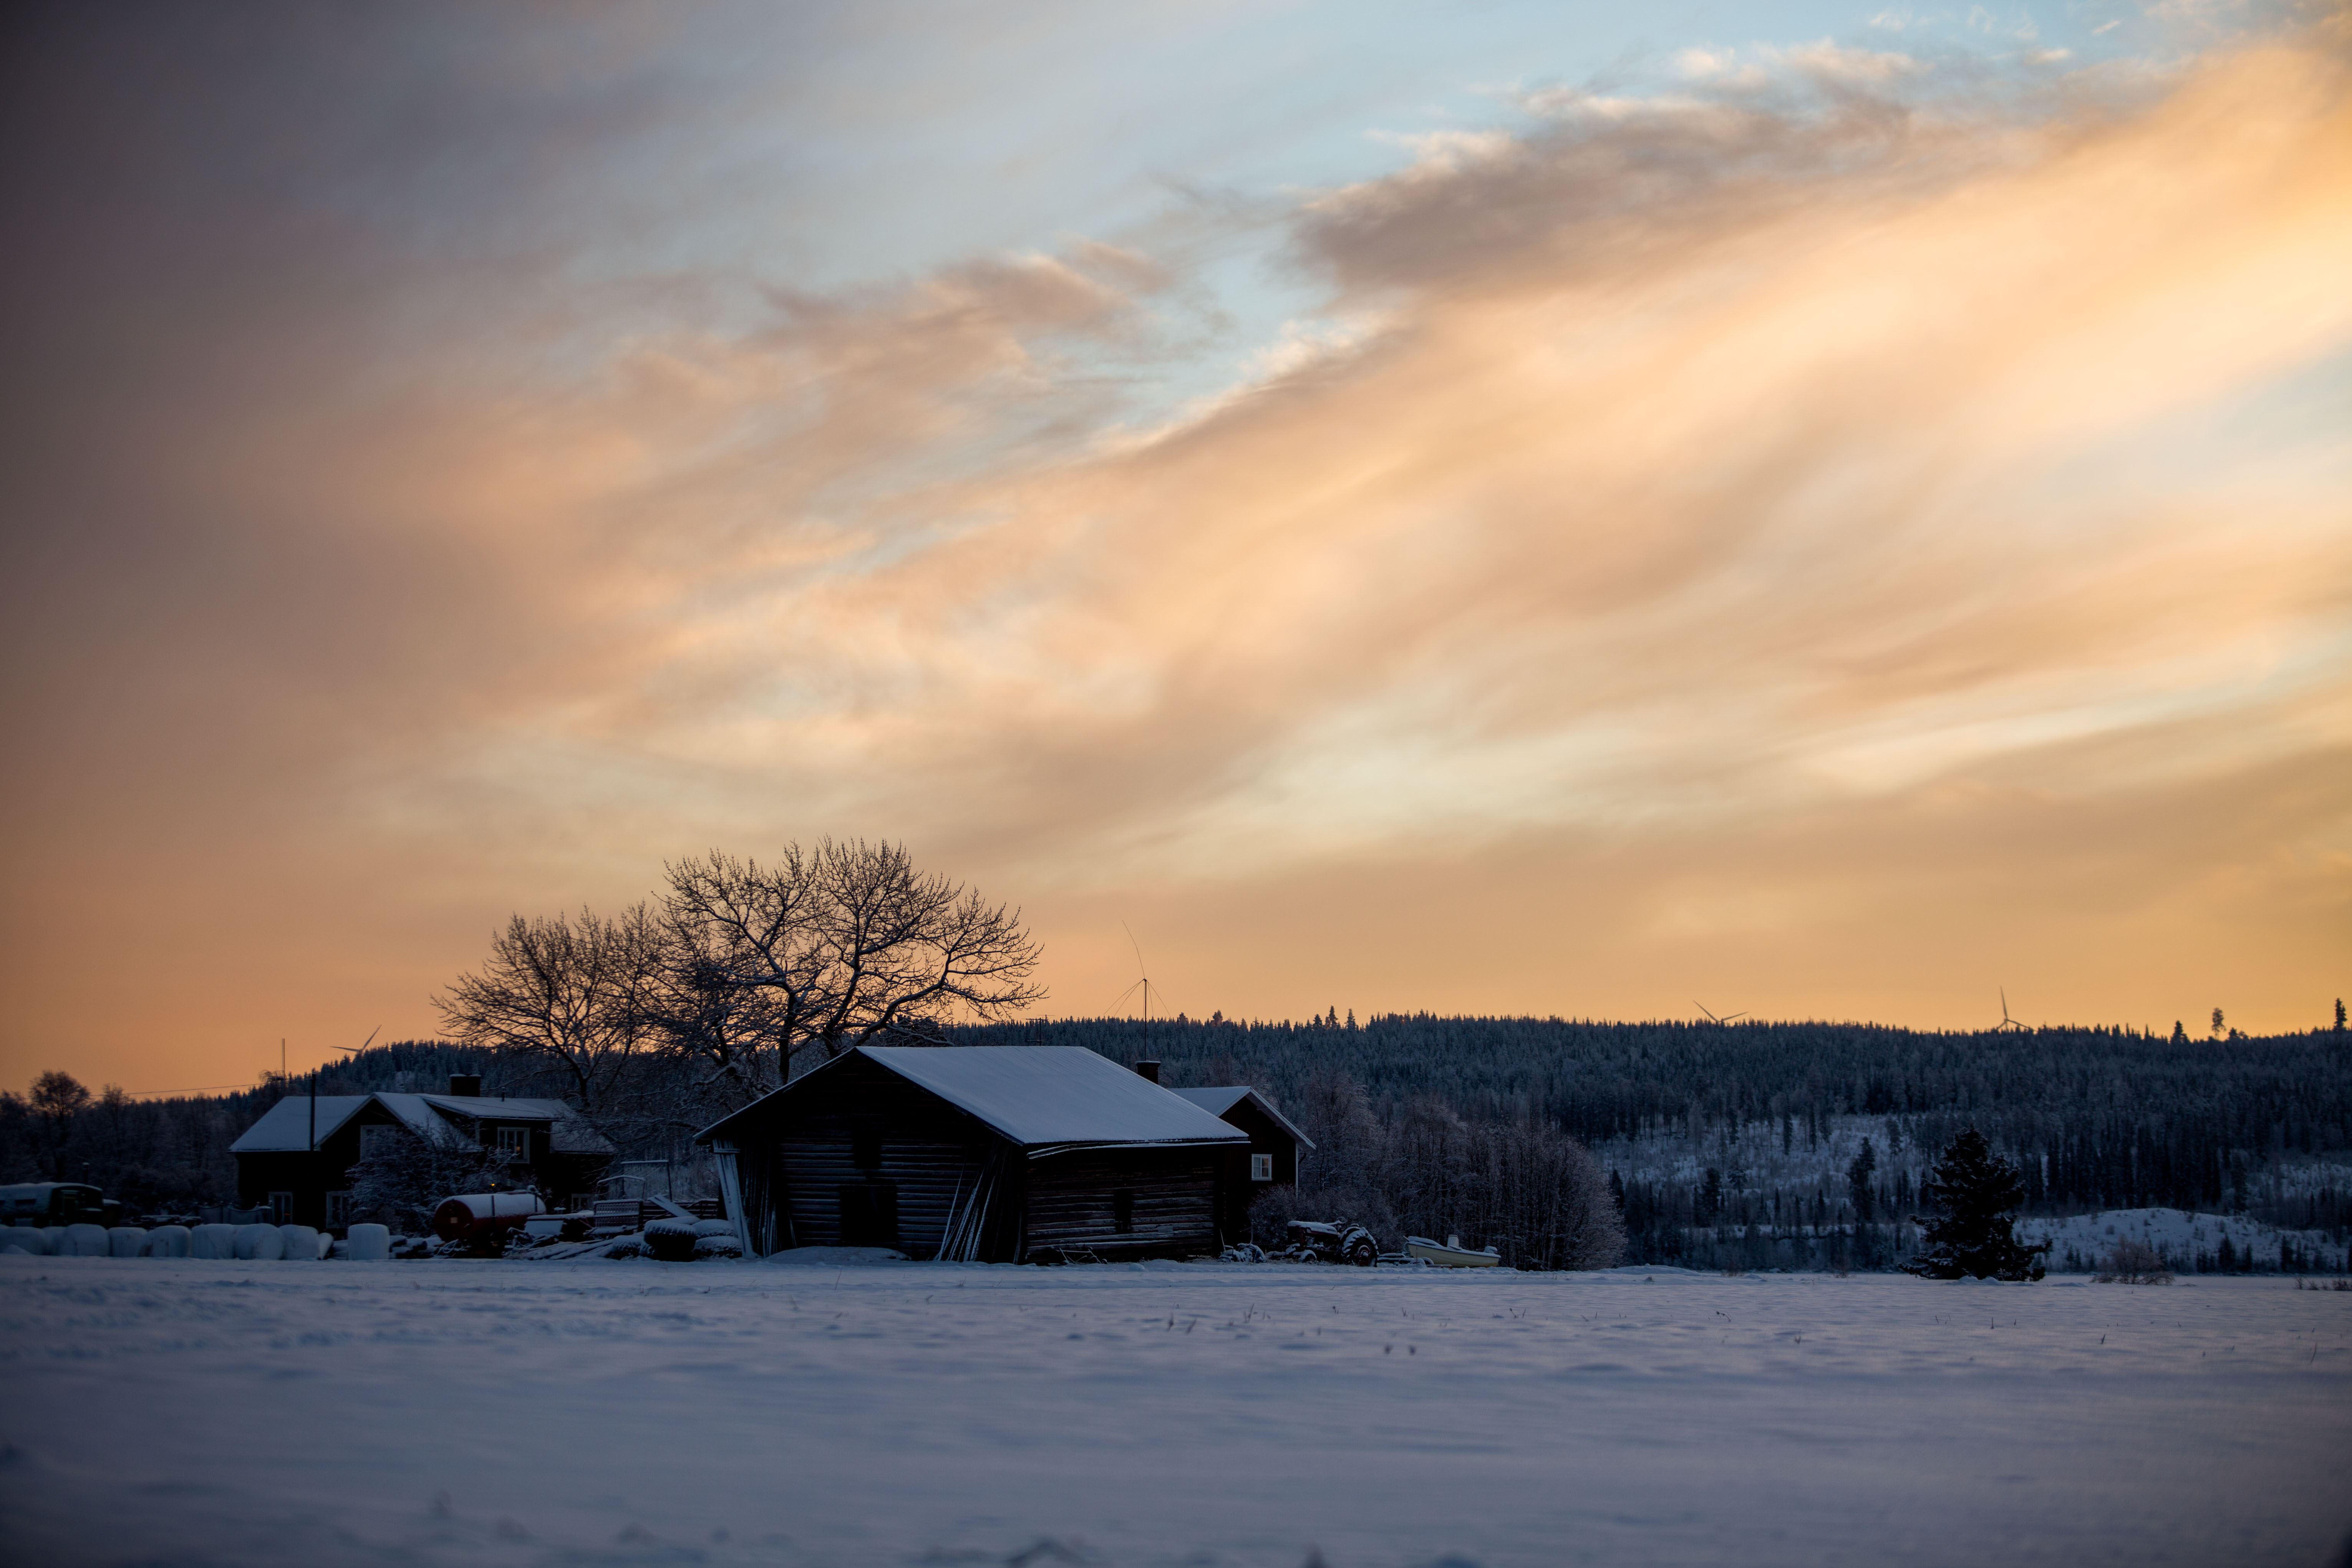 Ricke.se,  © Malå kommun, Årsmöte Sagabiografens intresseförening